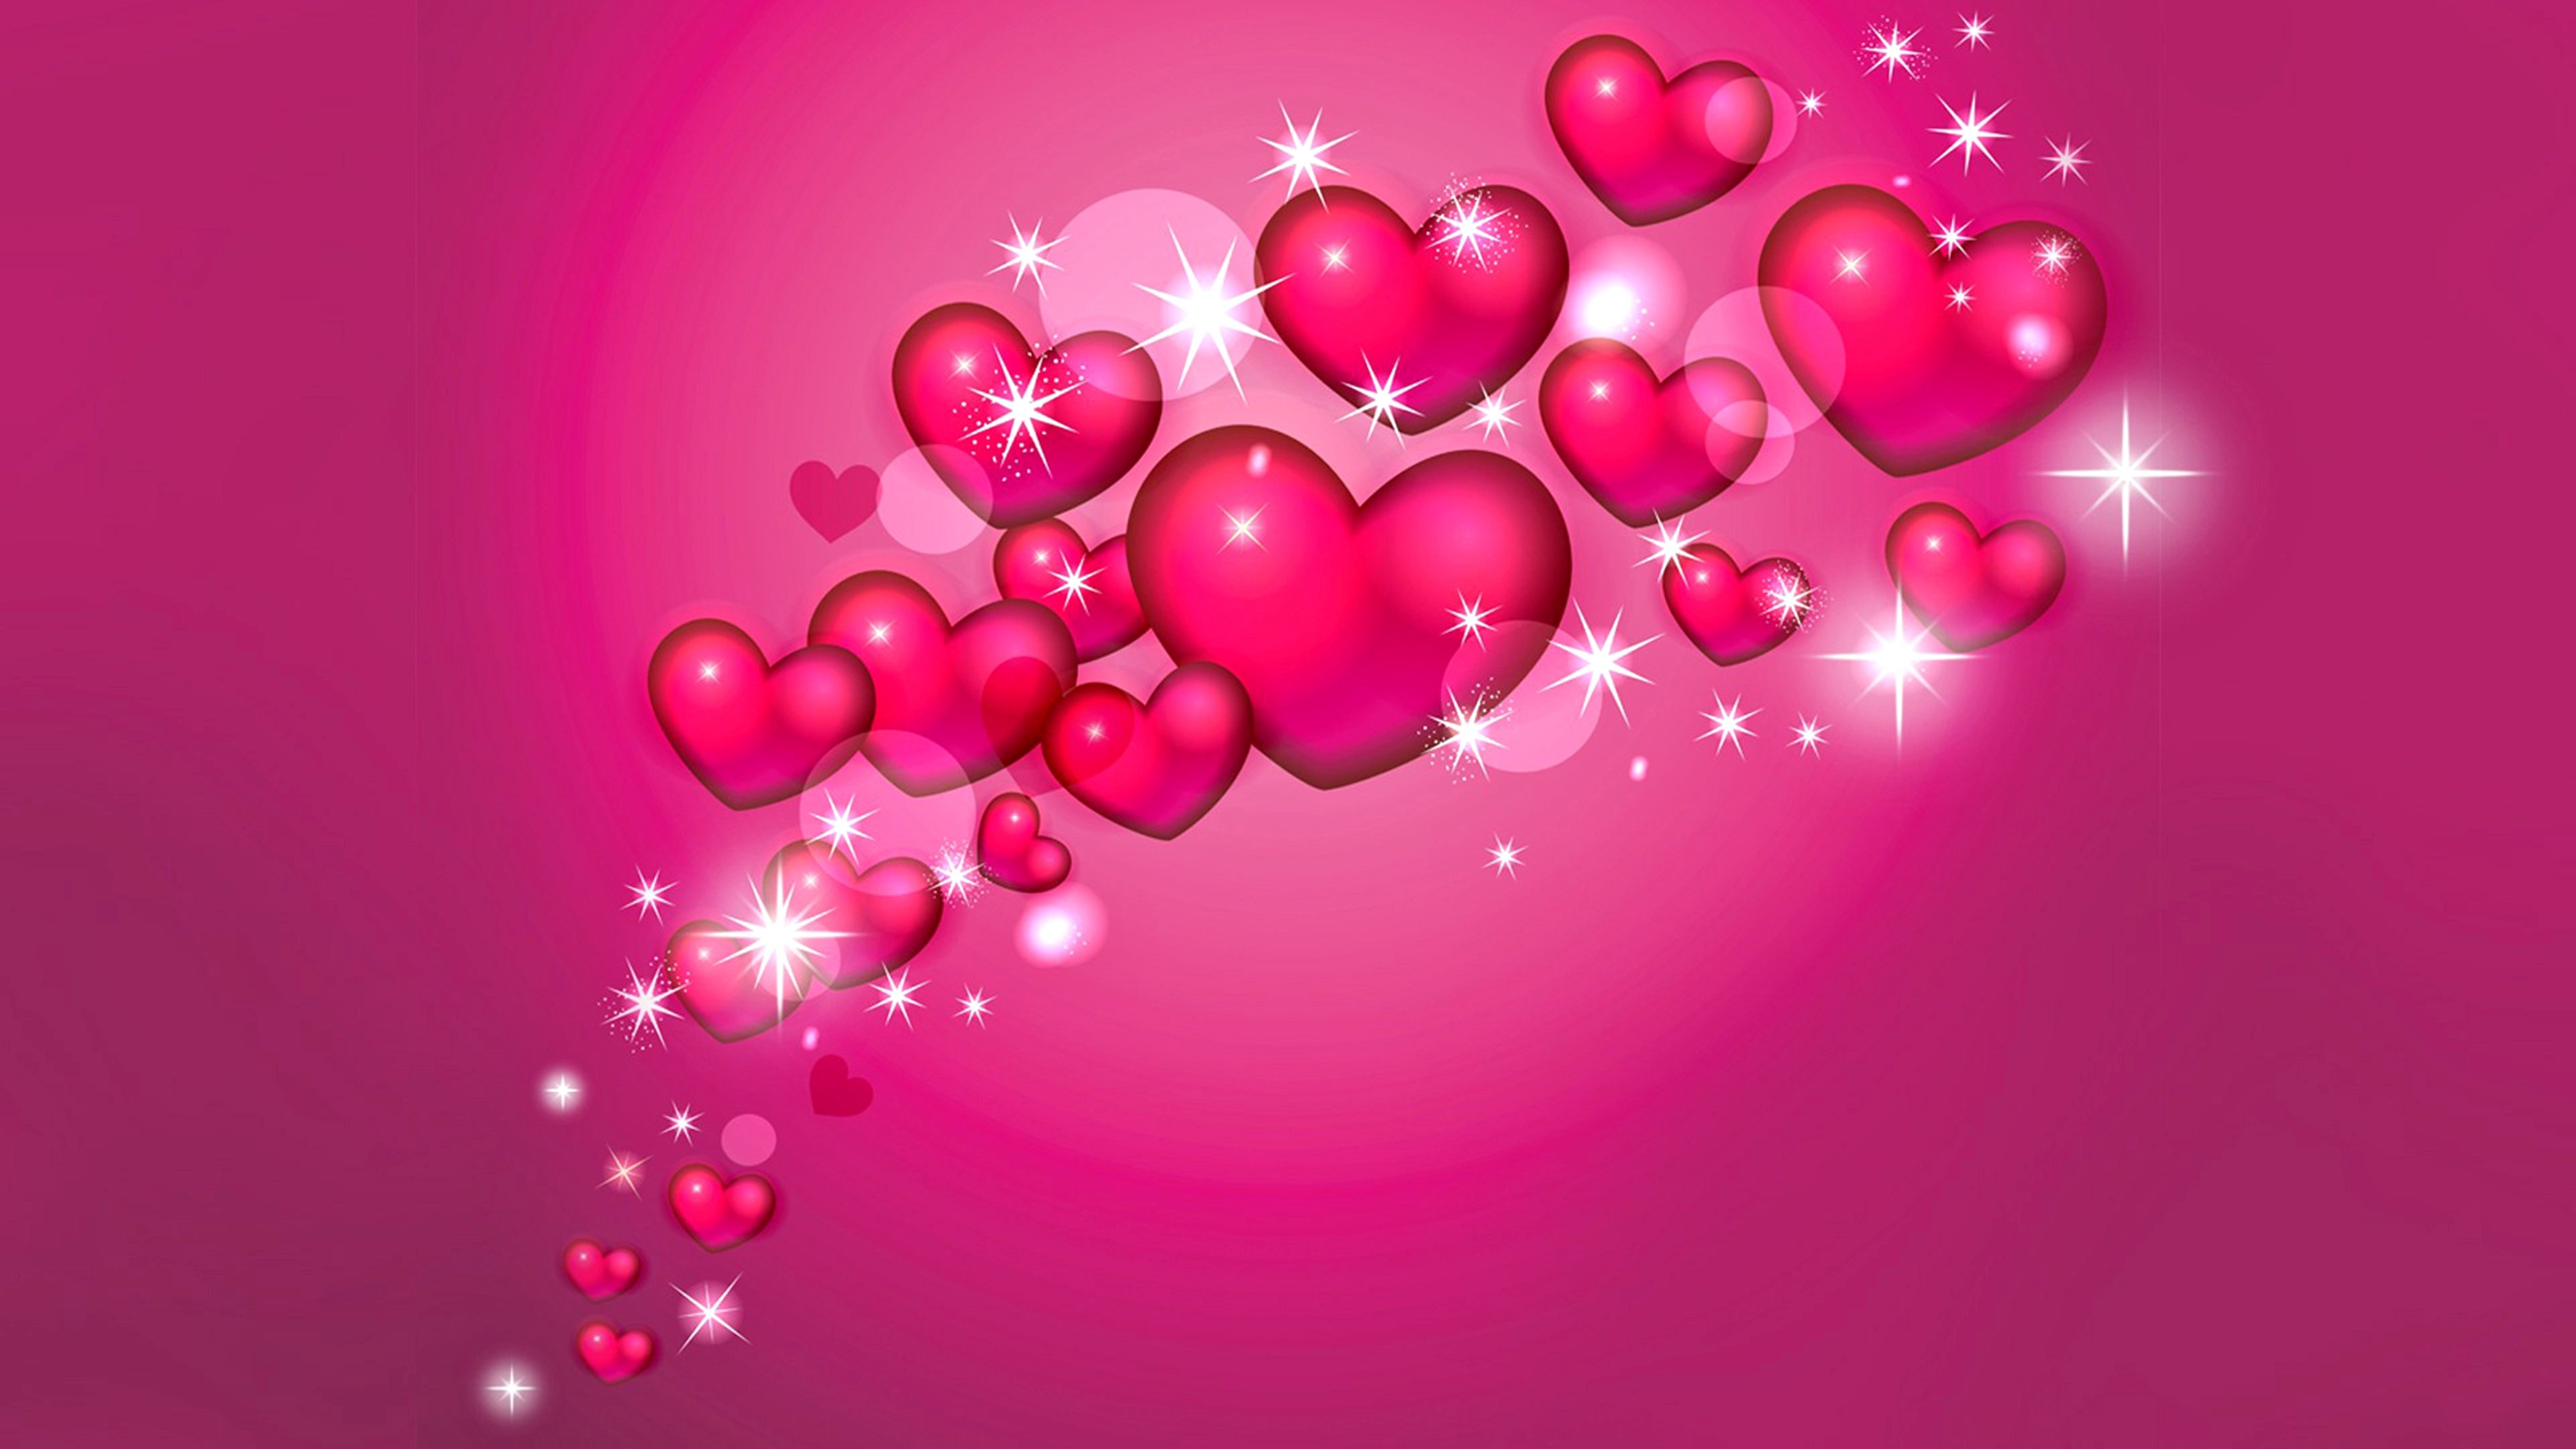 pink stars hearts wallpaper - photo #10